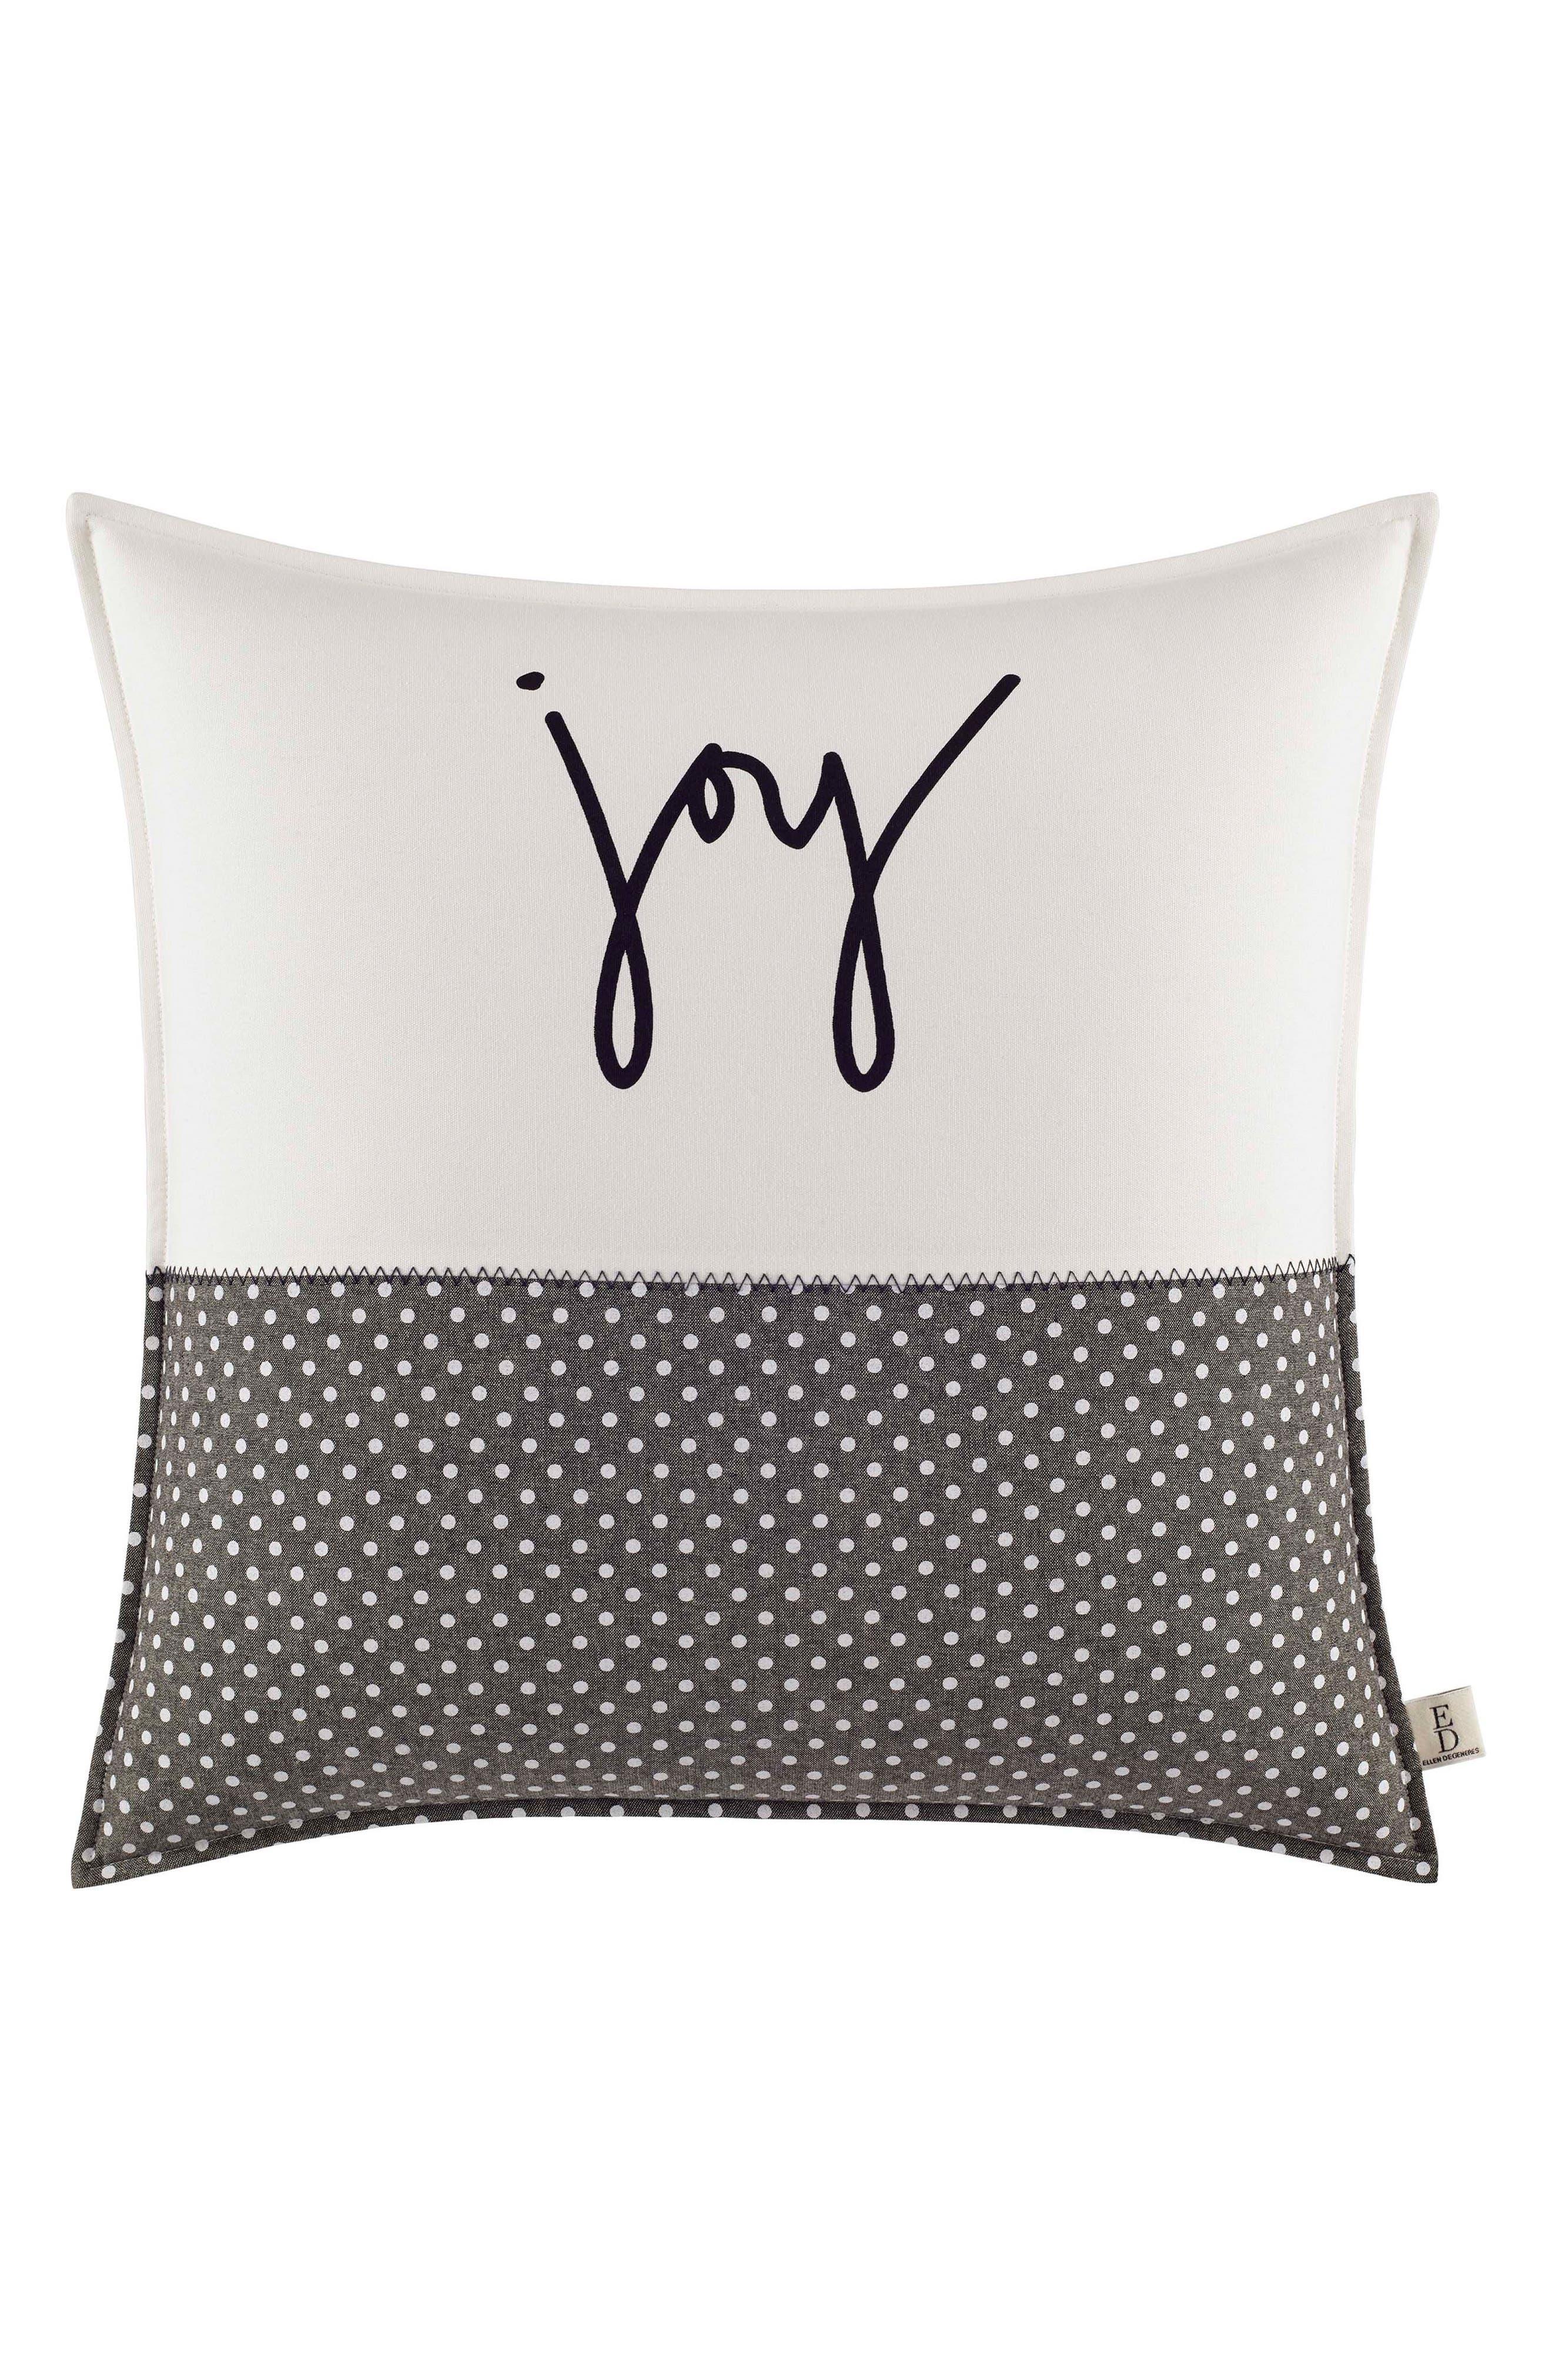 Joy Pillow,                             Main thumbnail 1, color,                             900